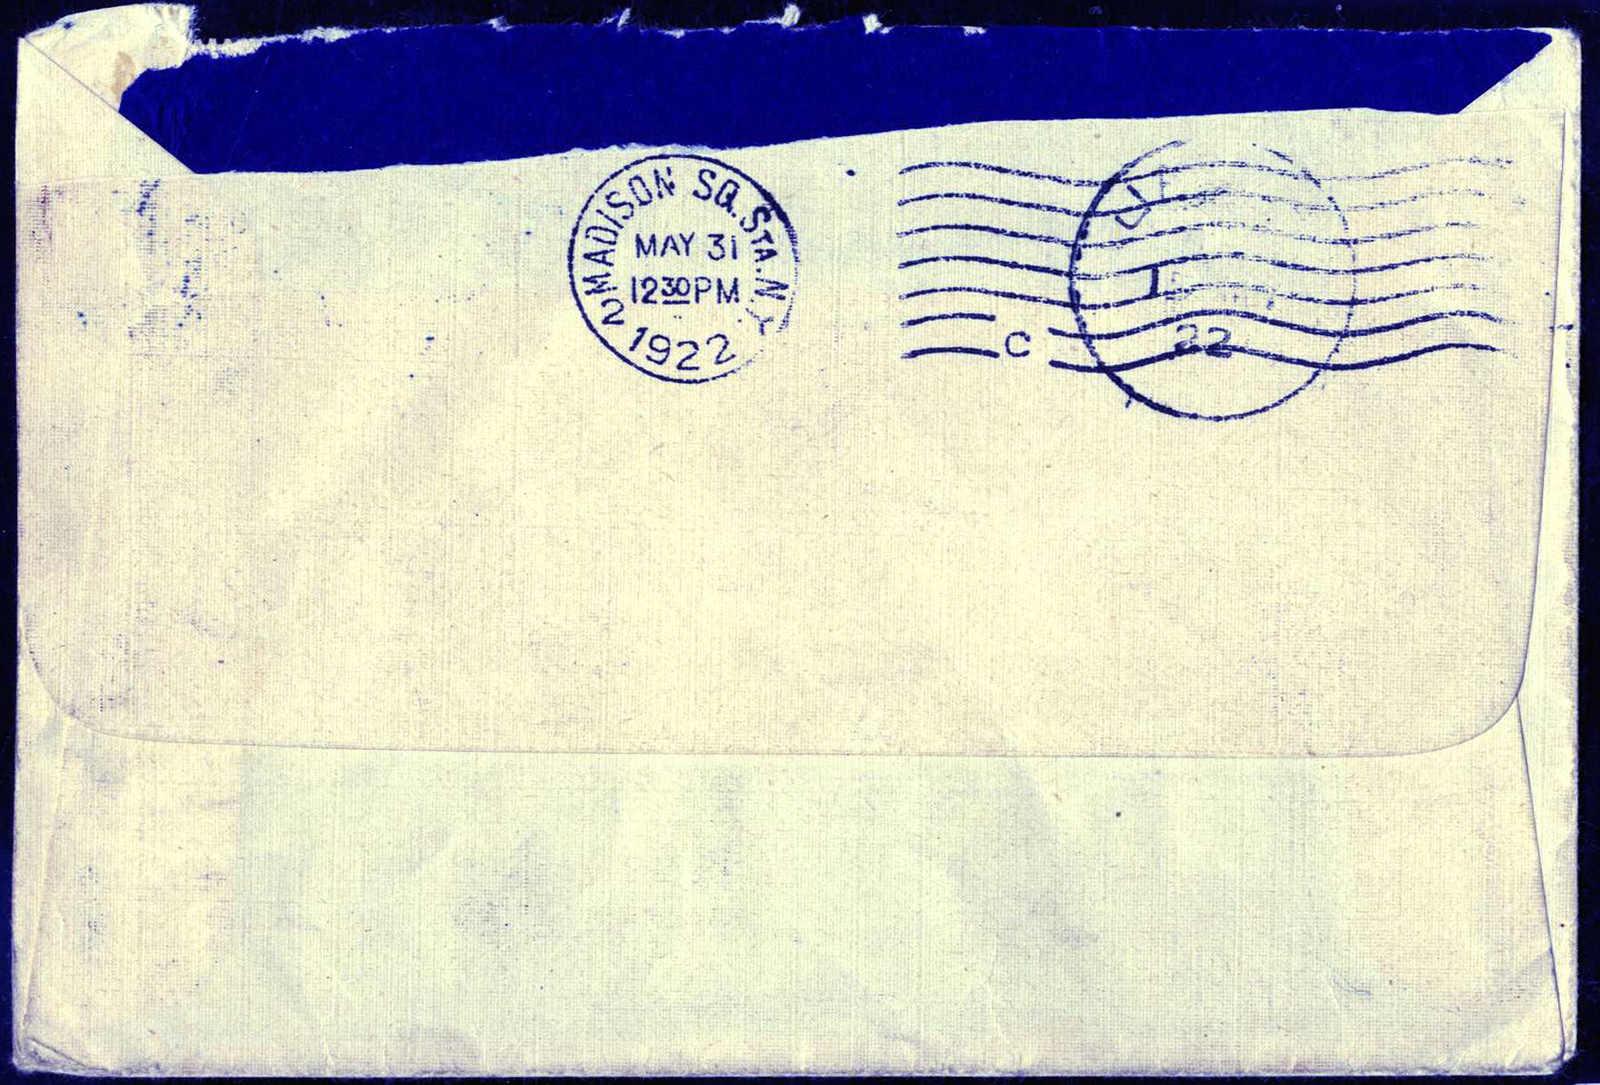 Lot 967 - andere gebiete Palästina E.E.F und Britische Verwaltungs Periode -  HA HARMERS AUCTIONS S.A. Treasure Hunt 3